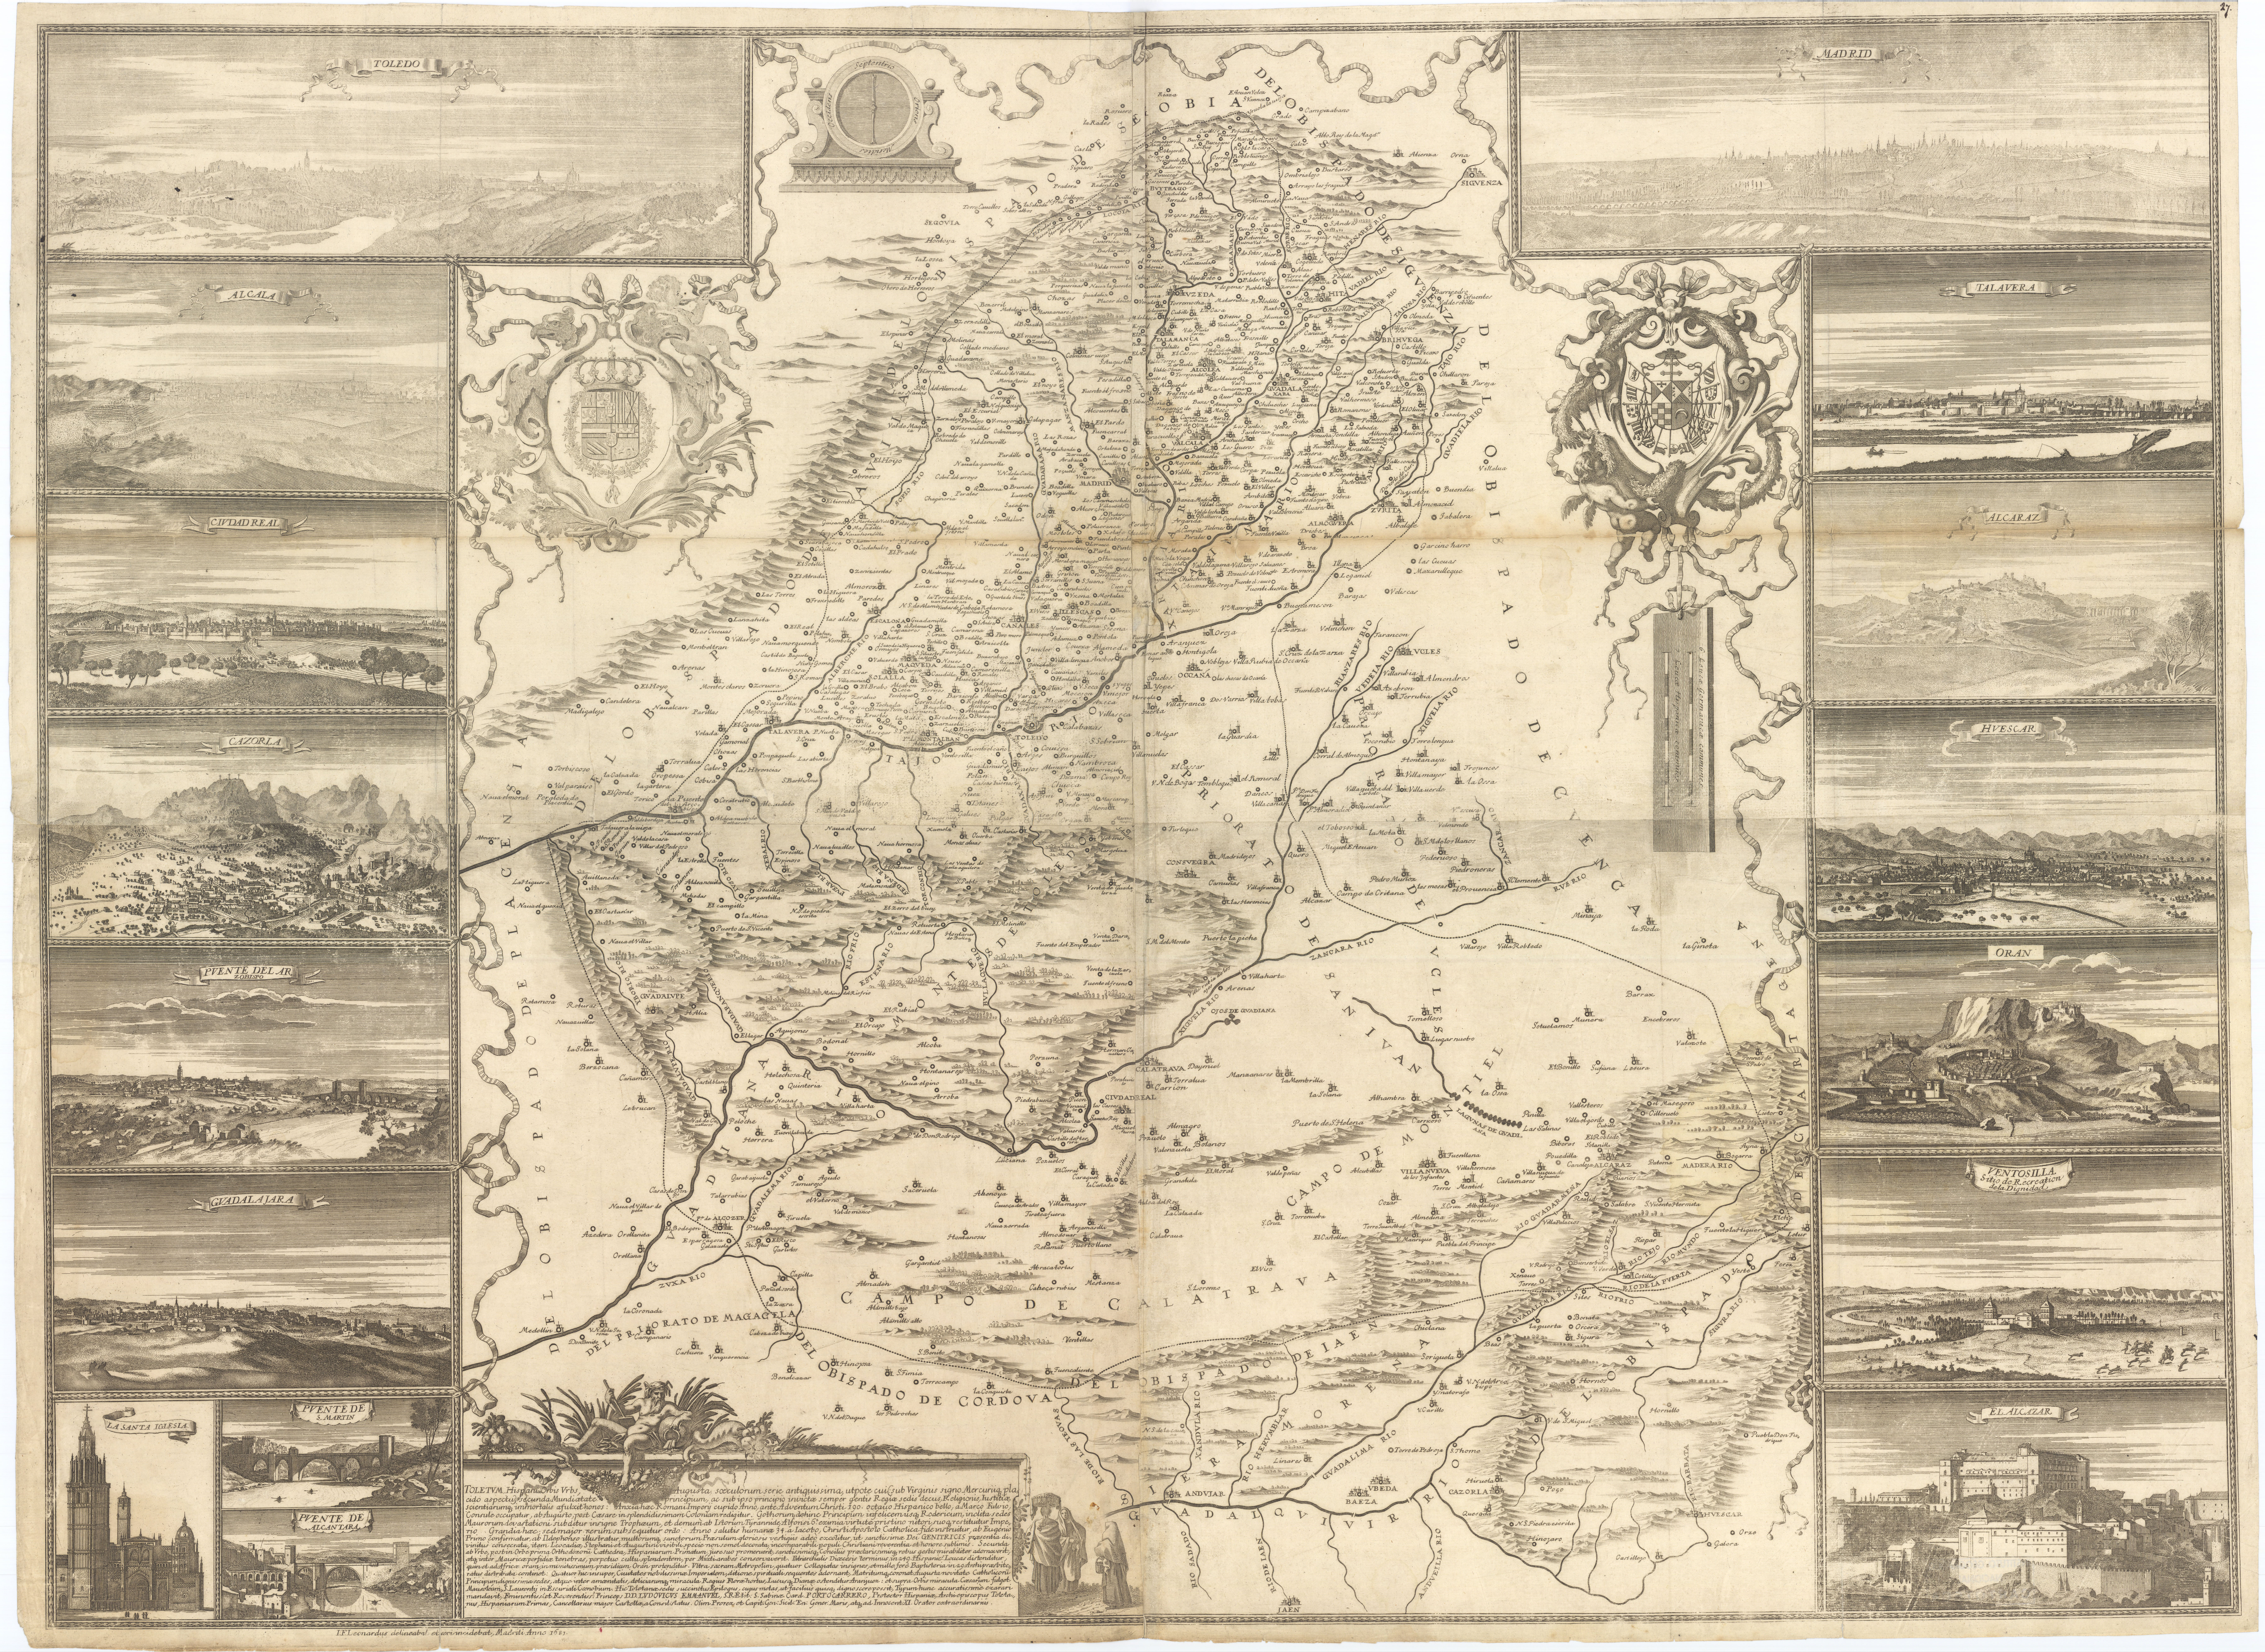 Mapa del arzobispado de Toledo en 1681